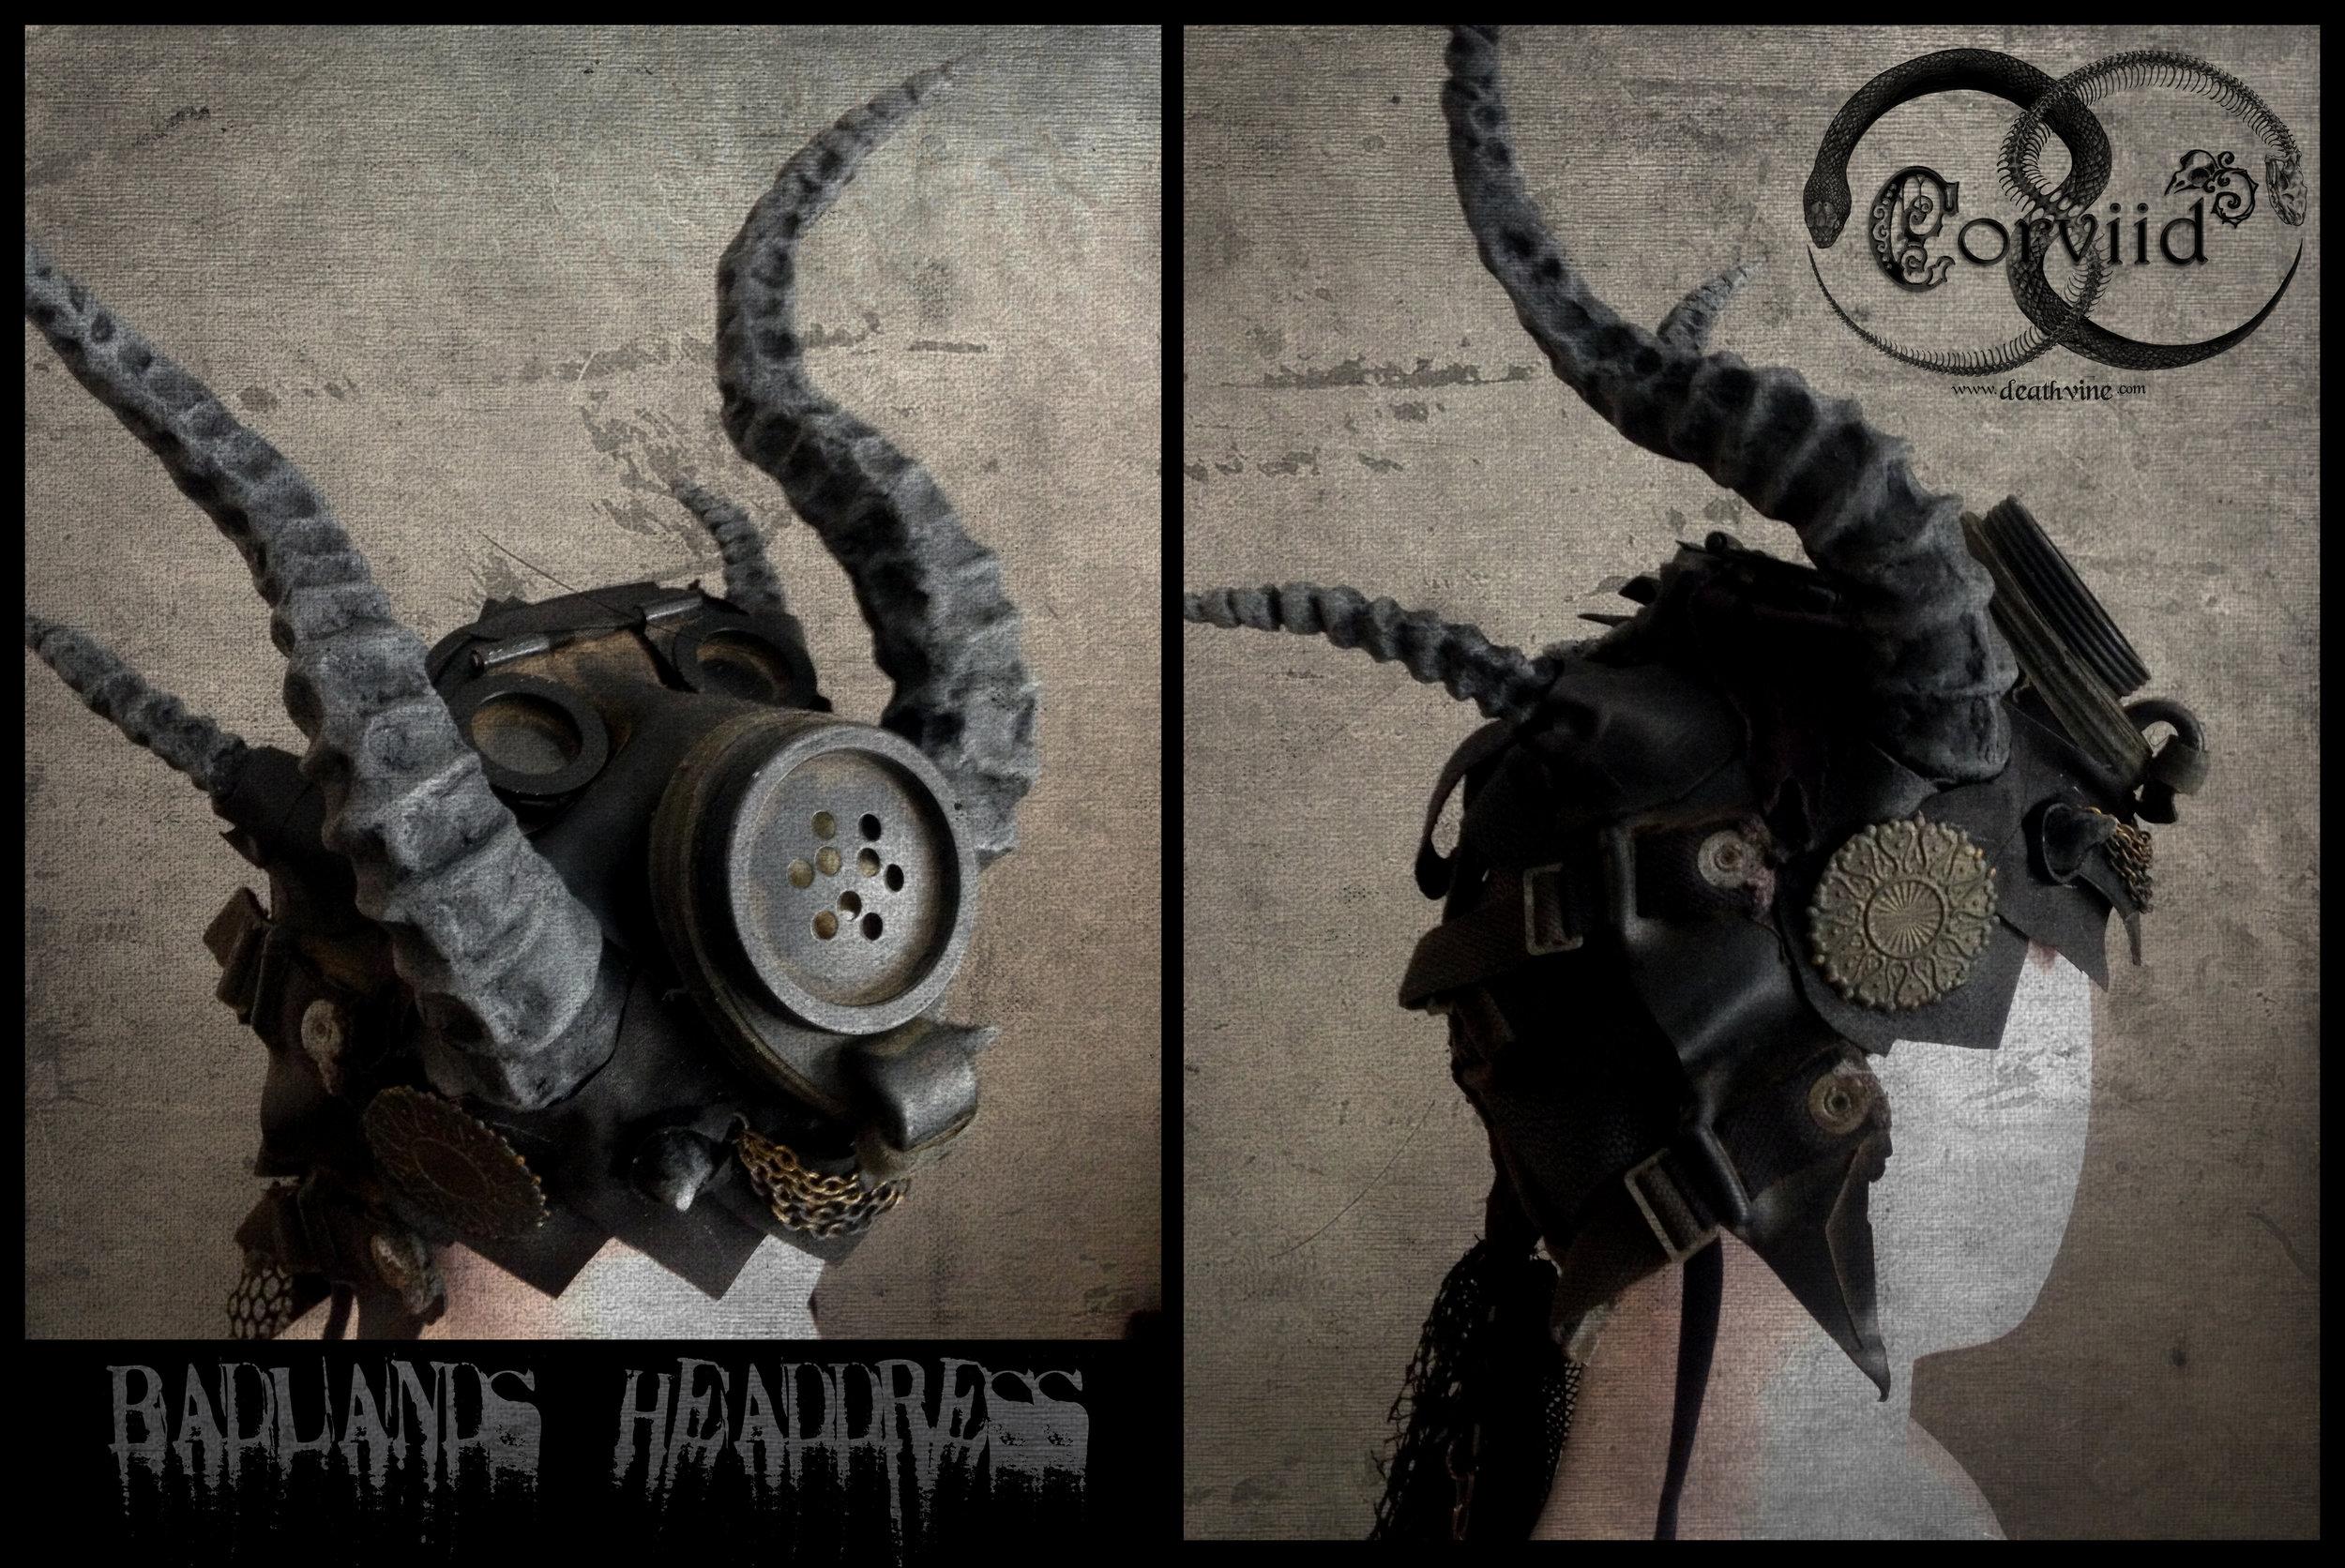 Badlands headdress.jpg